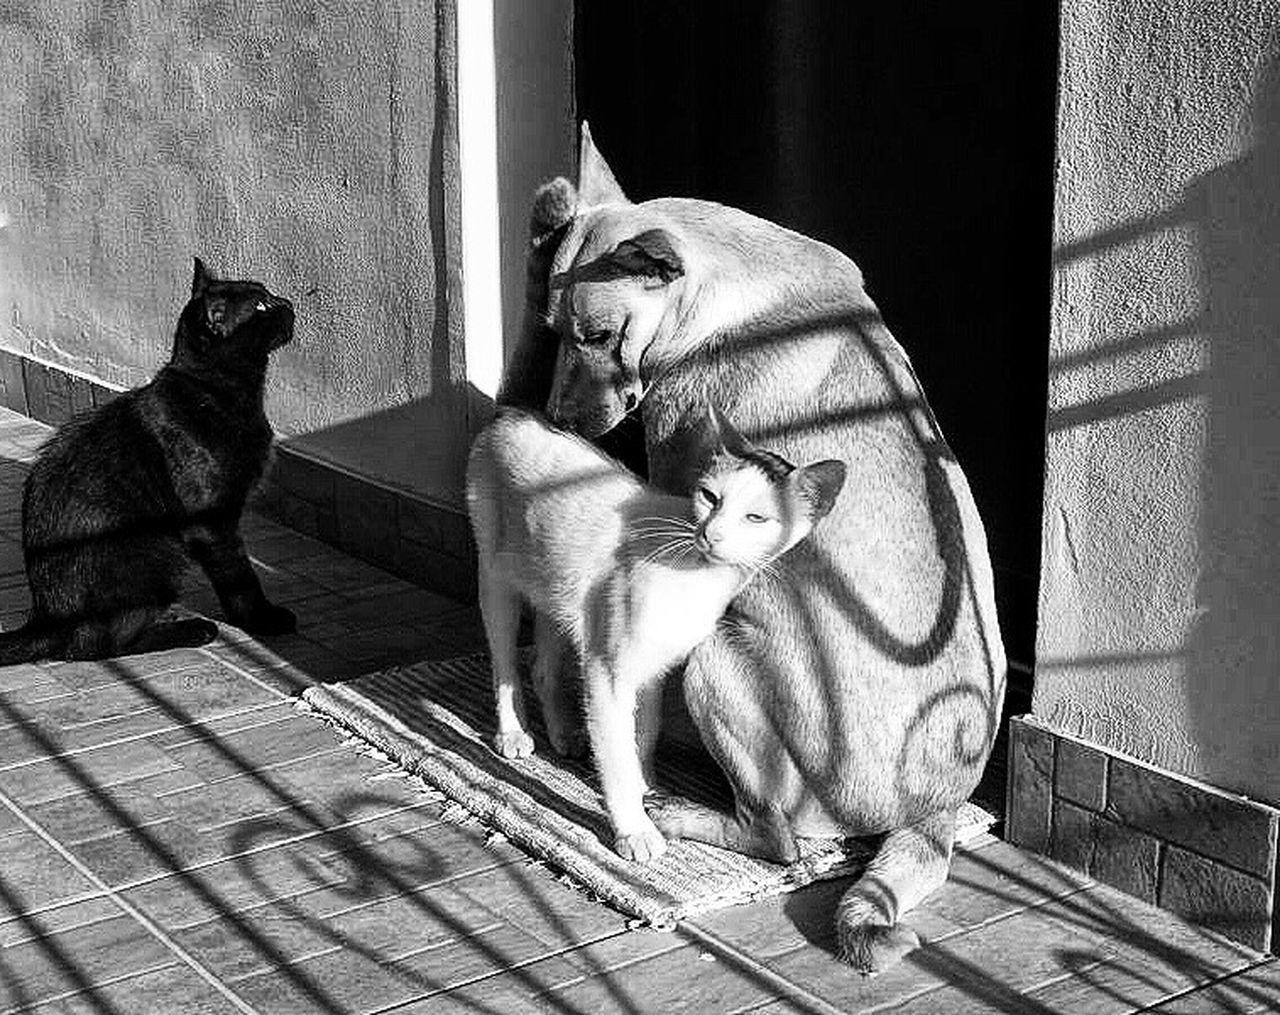 Pets Domestic Cat No People Blackandwhite Blackandwhitelovers Blackandwhitephotography Animal Themes Animals Big Love Cat&dog